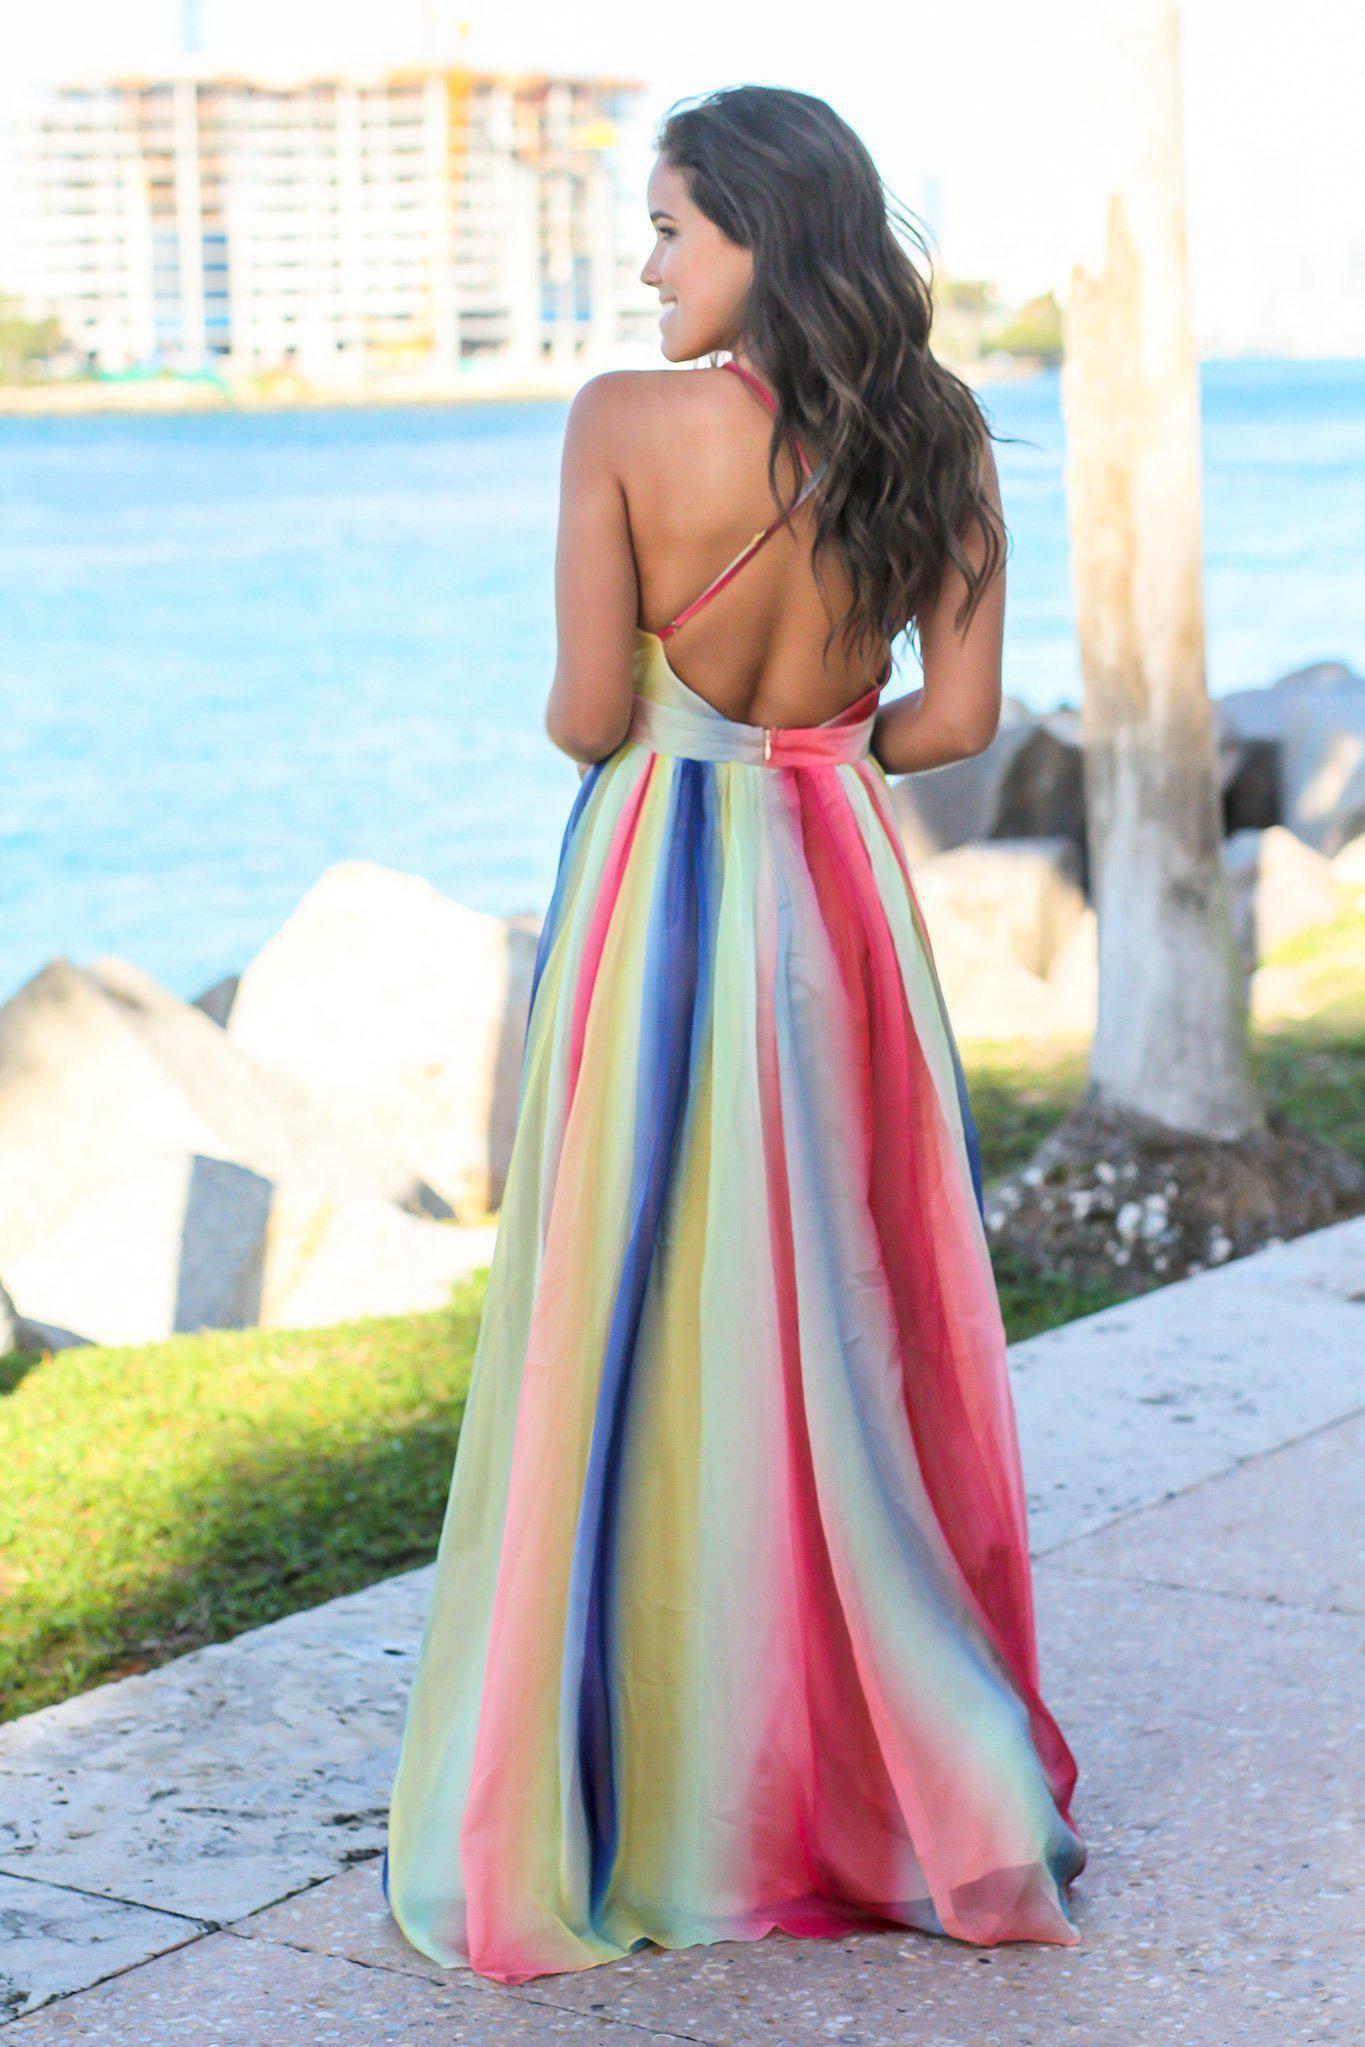 Rainbow Maxi Dress With Criss Cross Back Maxi Dress Dresses Saved By The Dress [ 2047 x 1365 Pixel ]